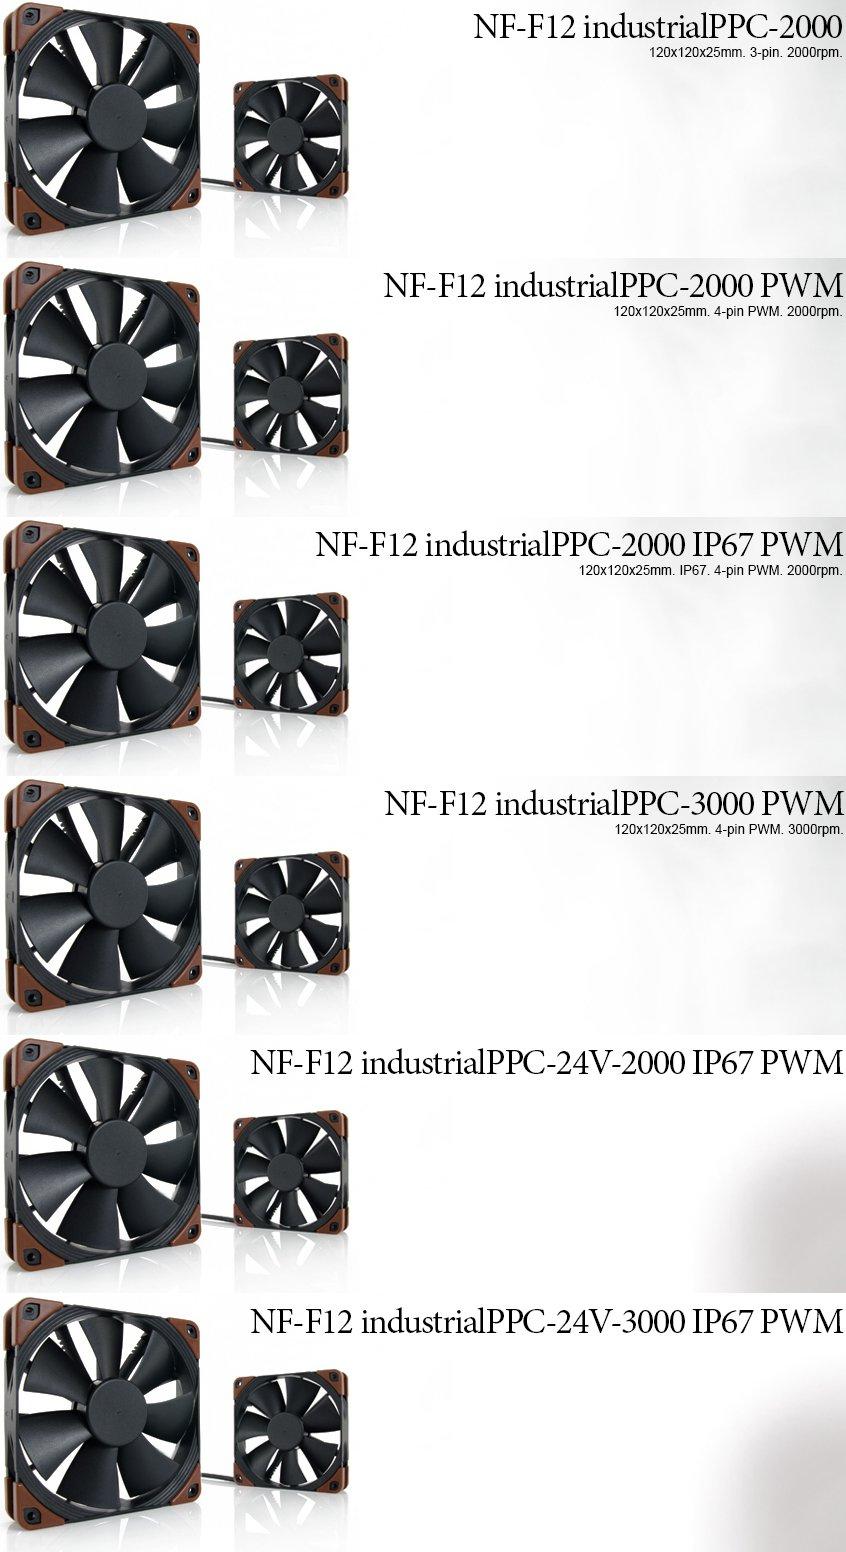 Noctua_serie_NF-F12_Industrial_PPC